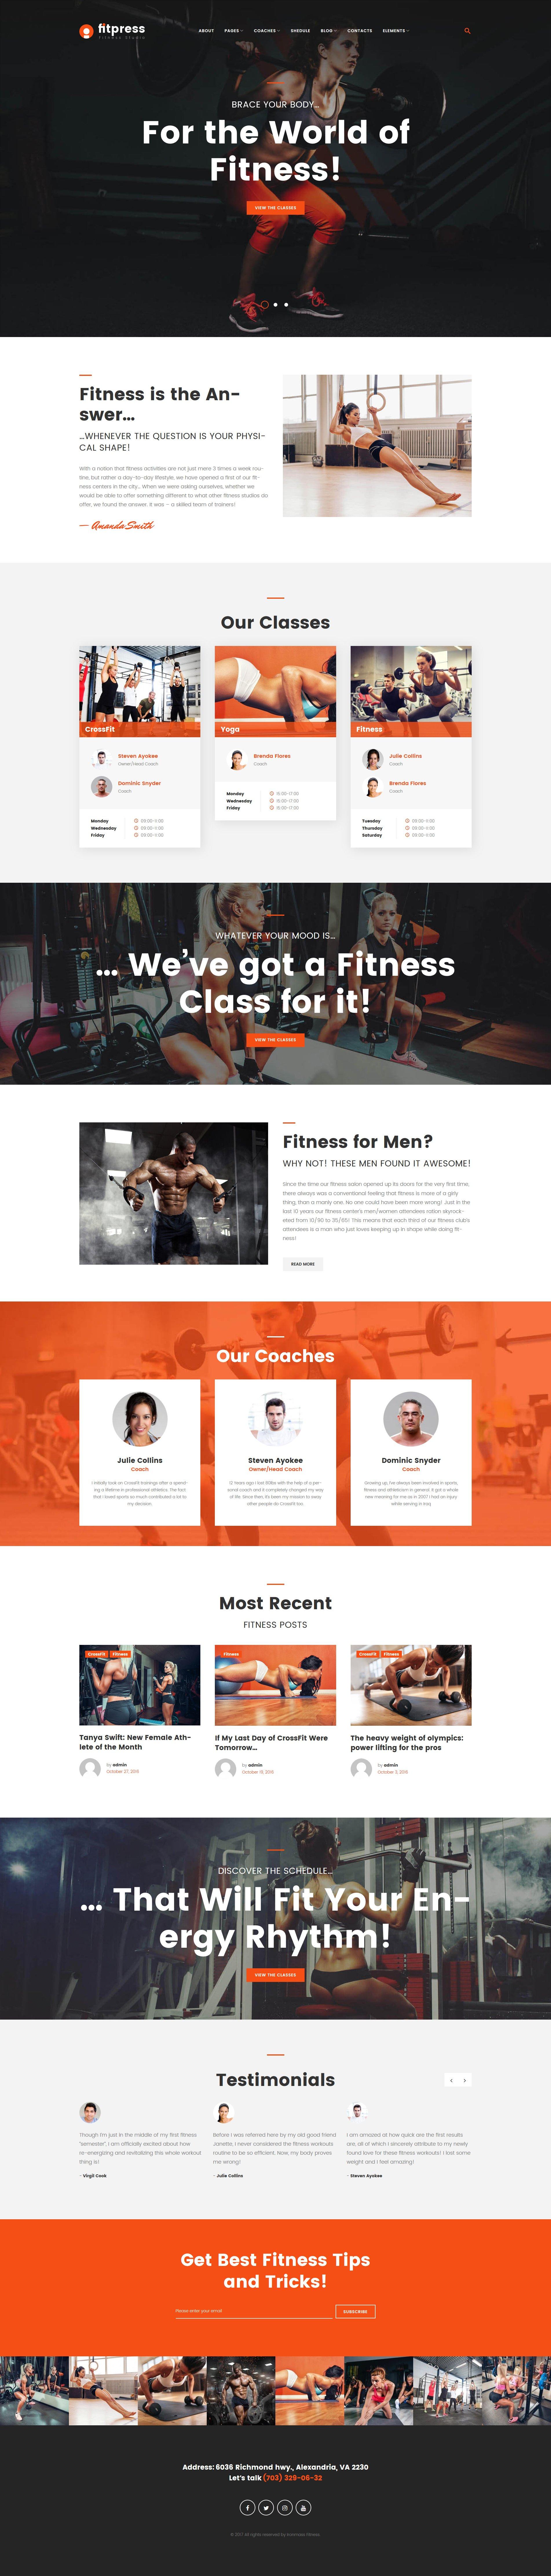 Fitpress - Fitness & Gym WordPress Theme - screenshot